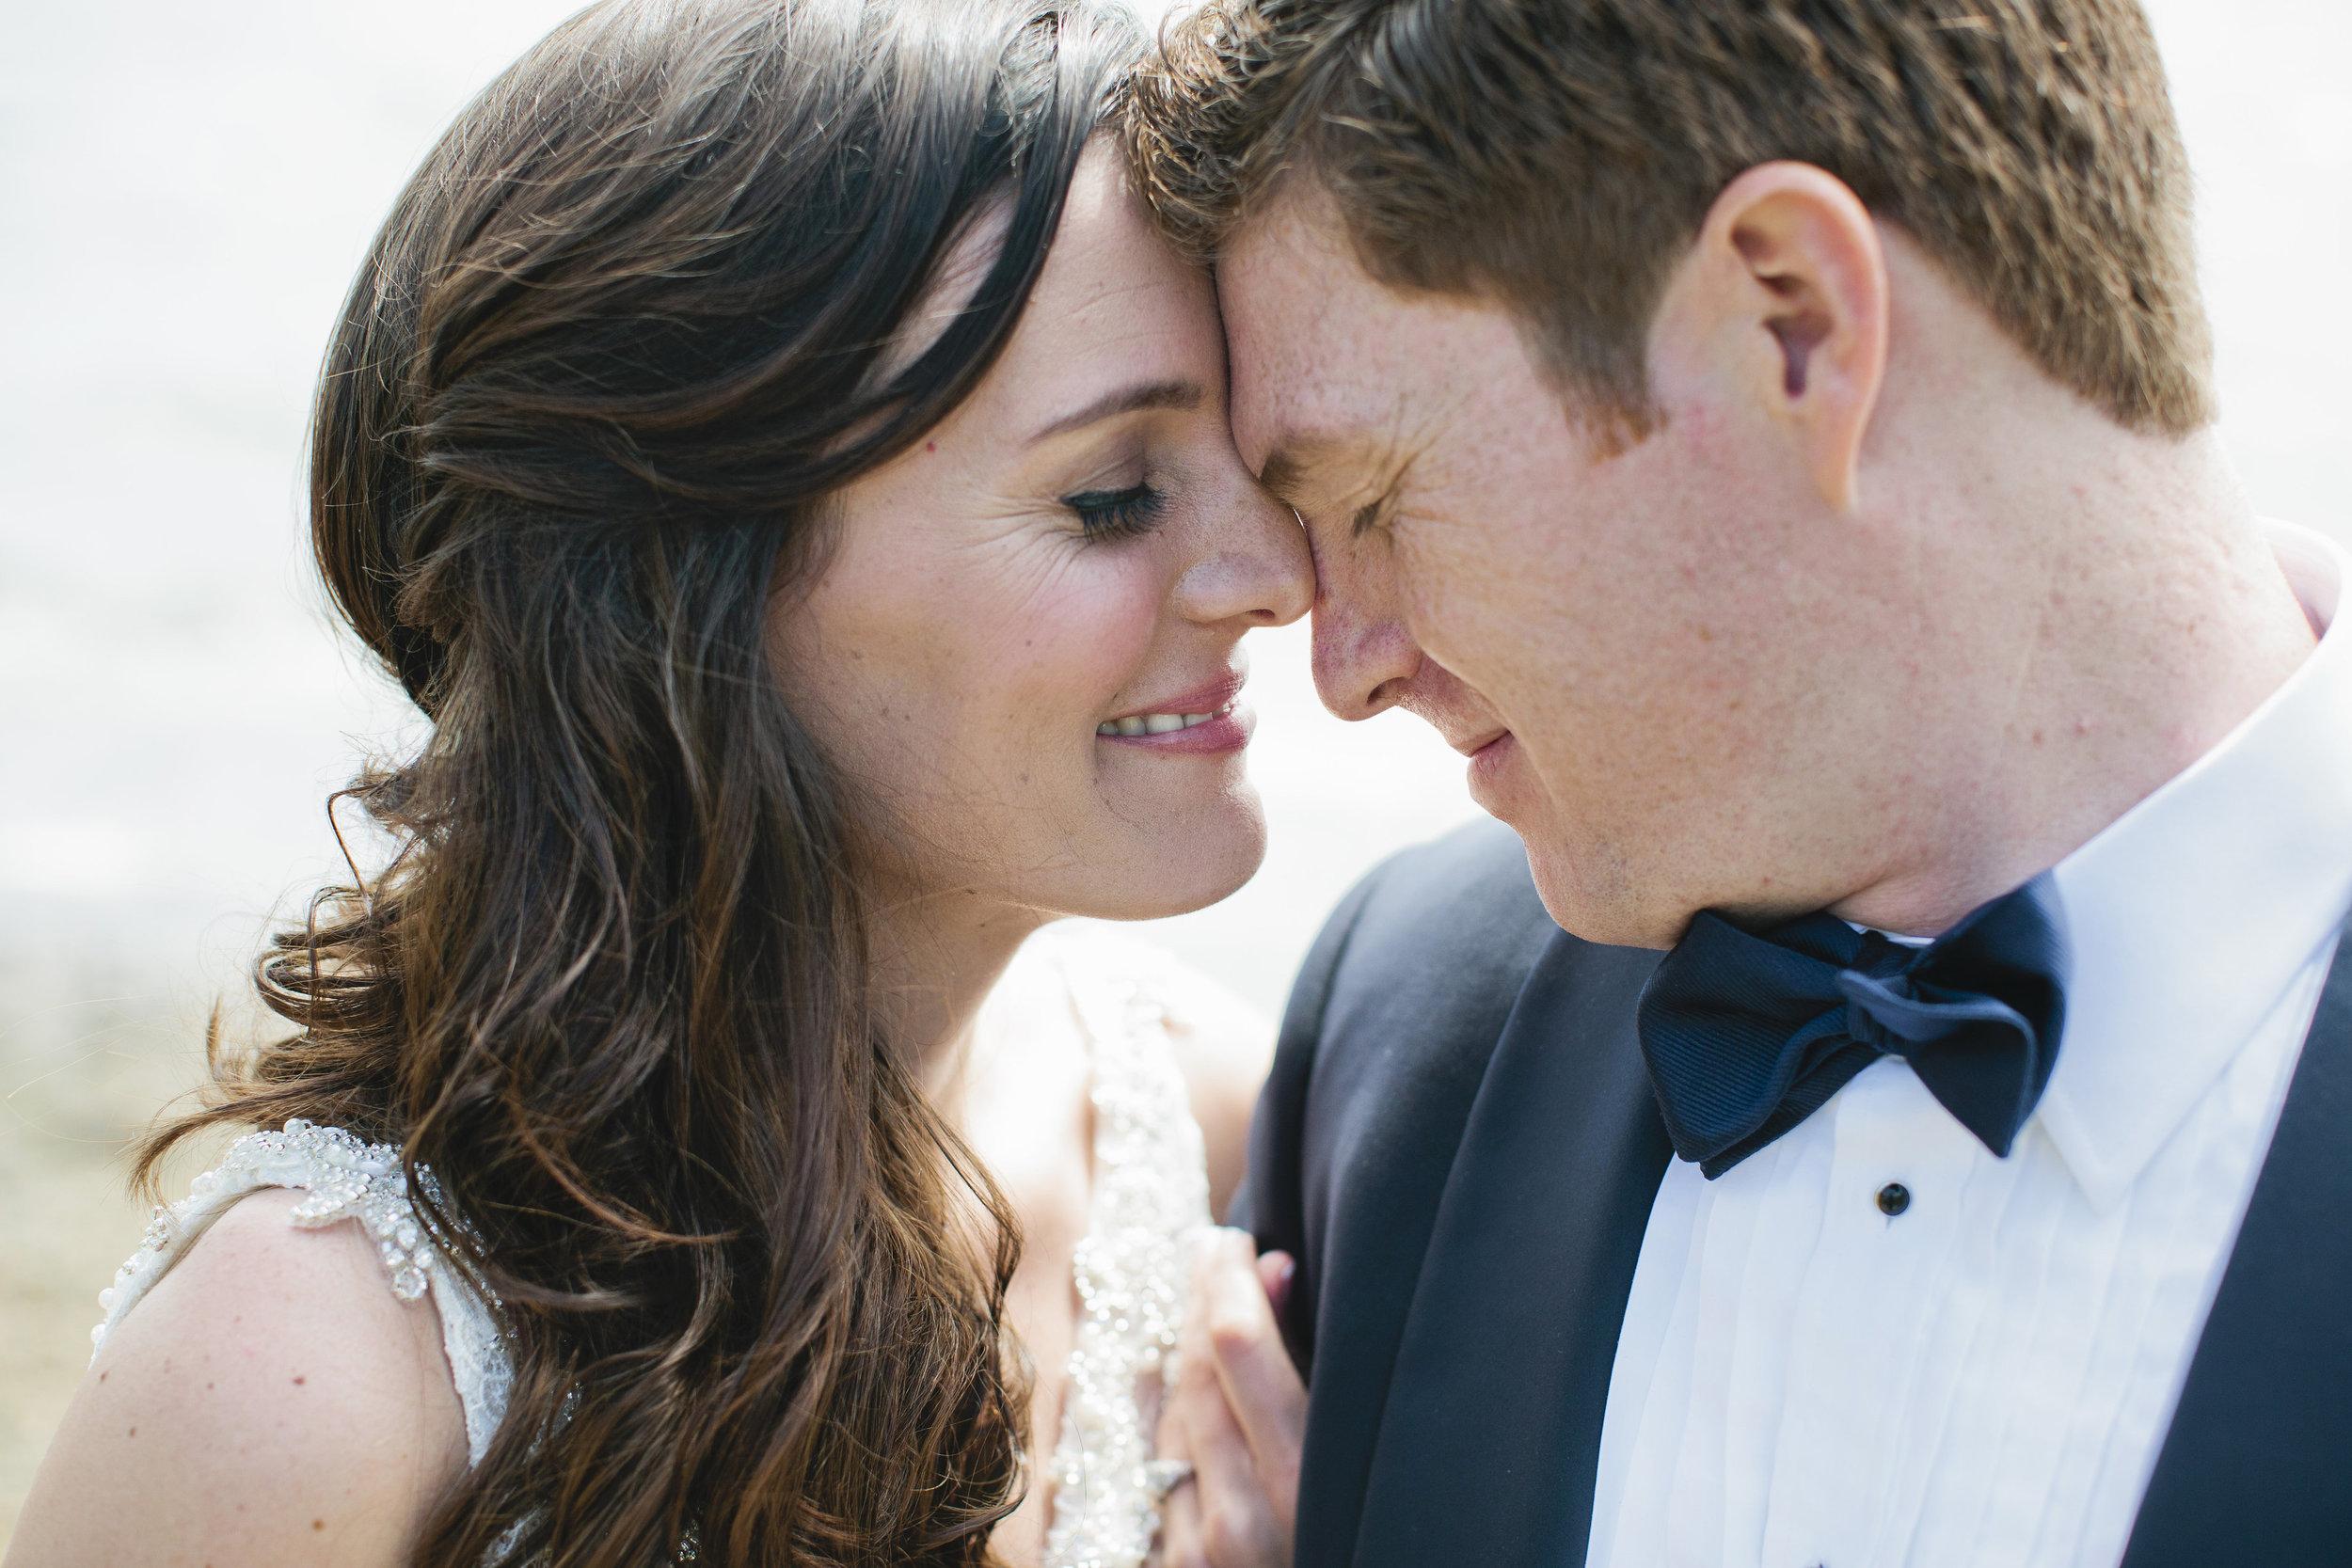 Wedding-Portrait-Photo-01.JPG